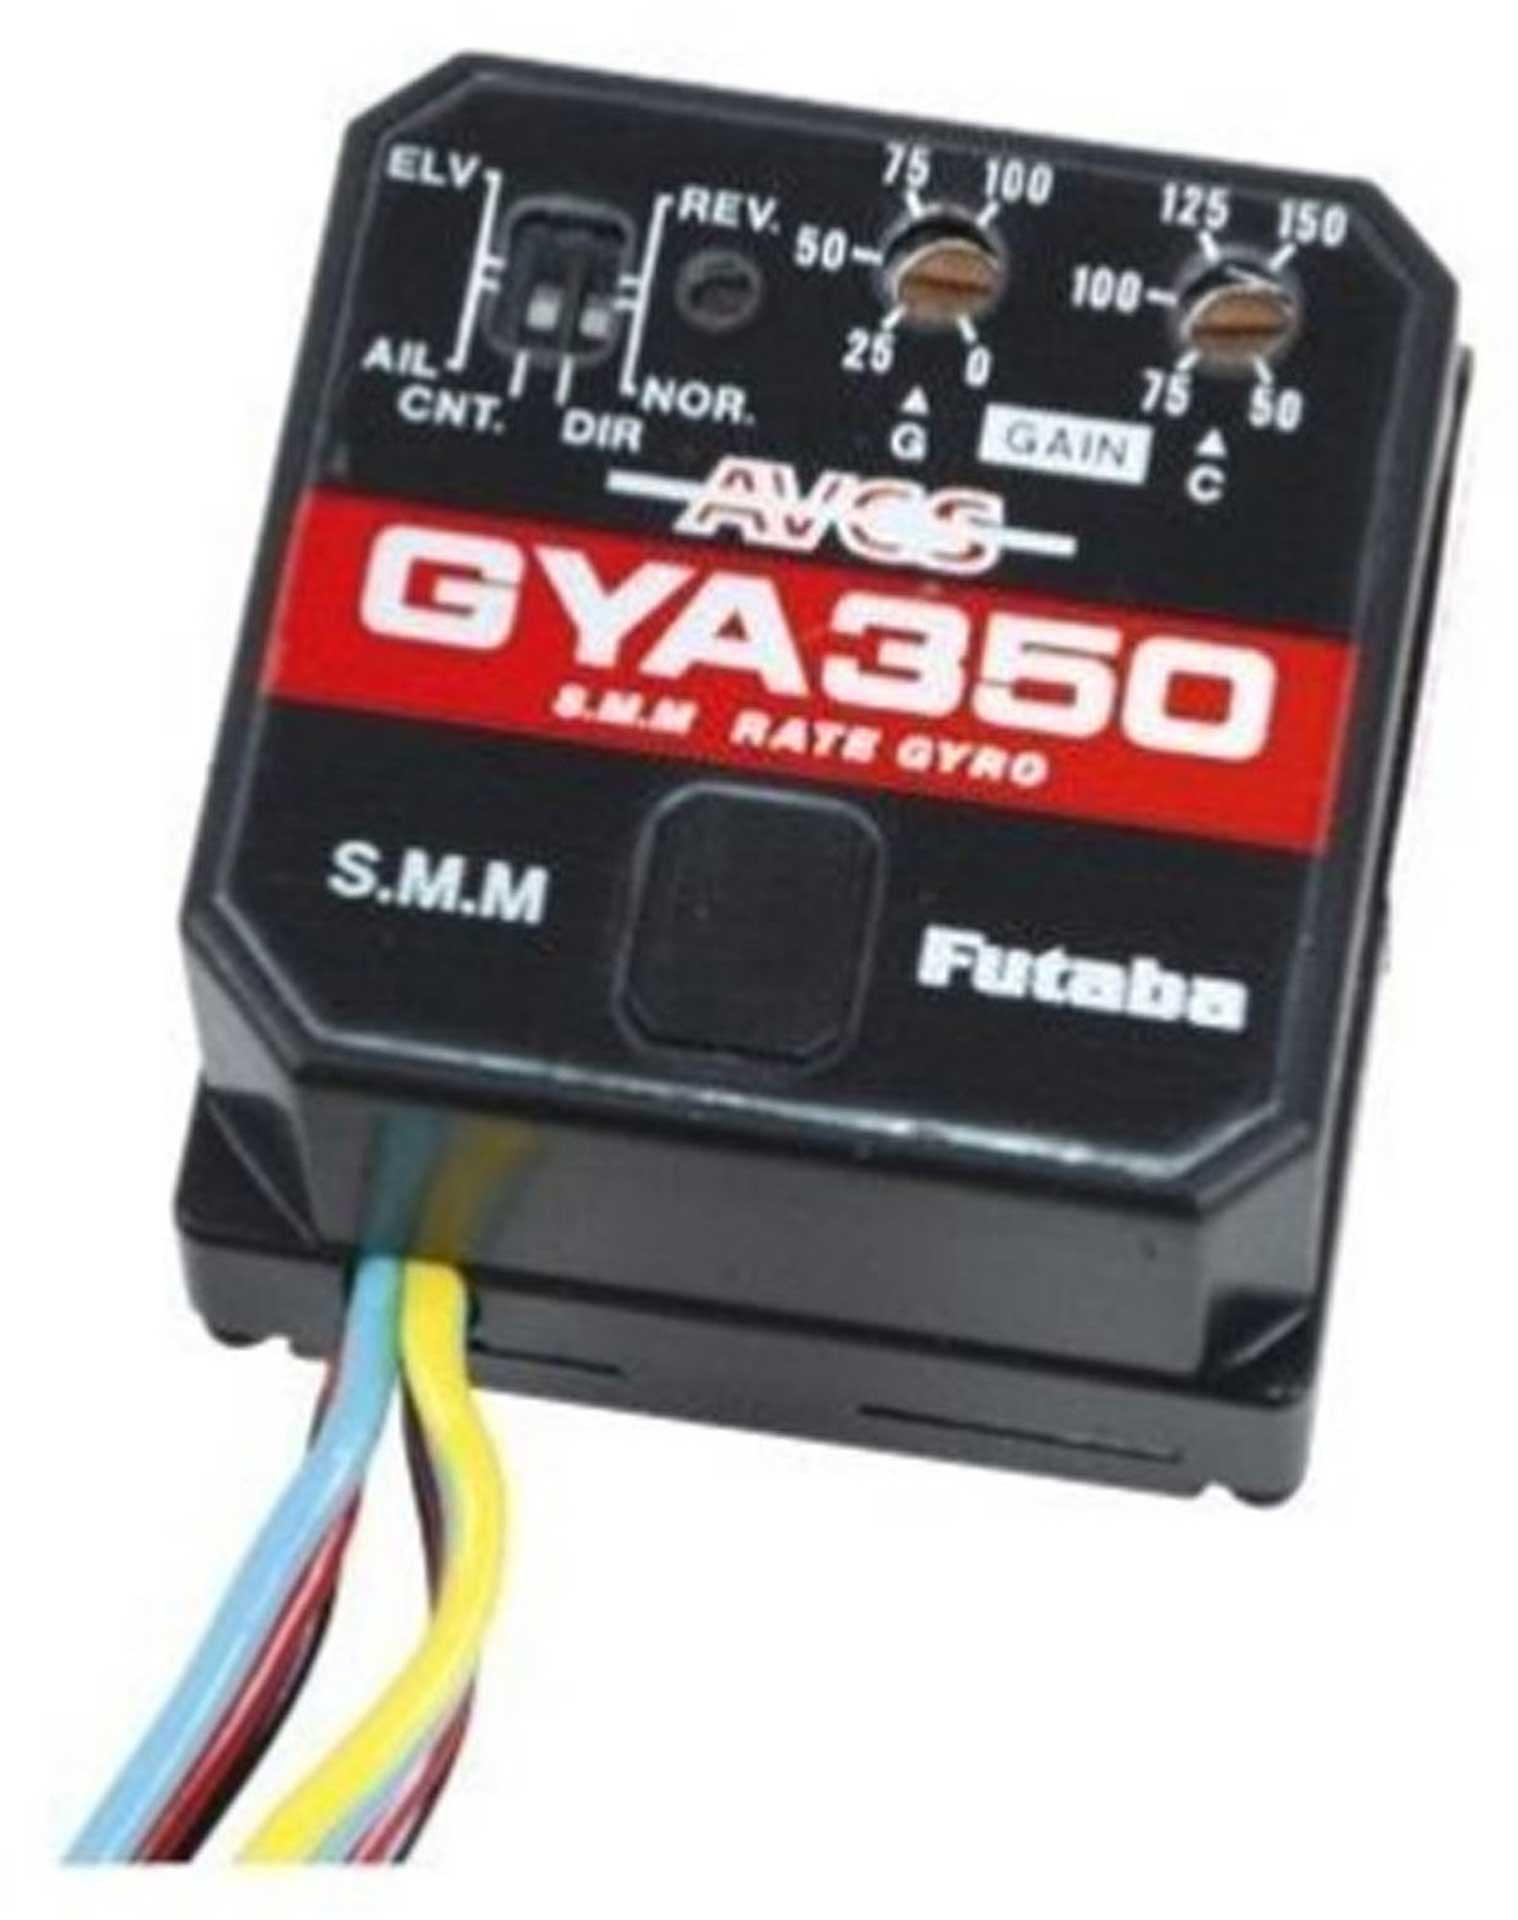 FUTABA AERO-SPINNING TOP GYA350